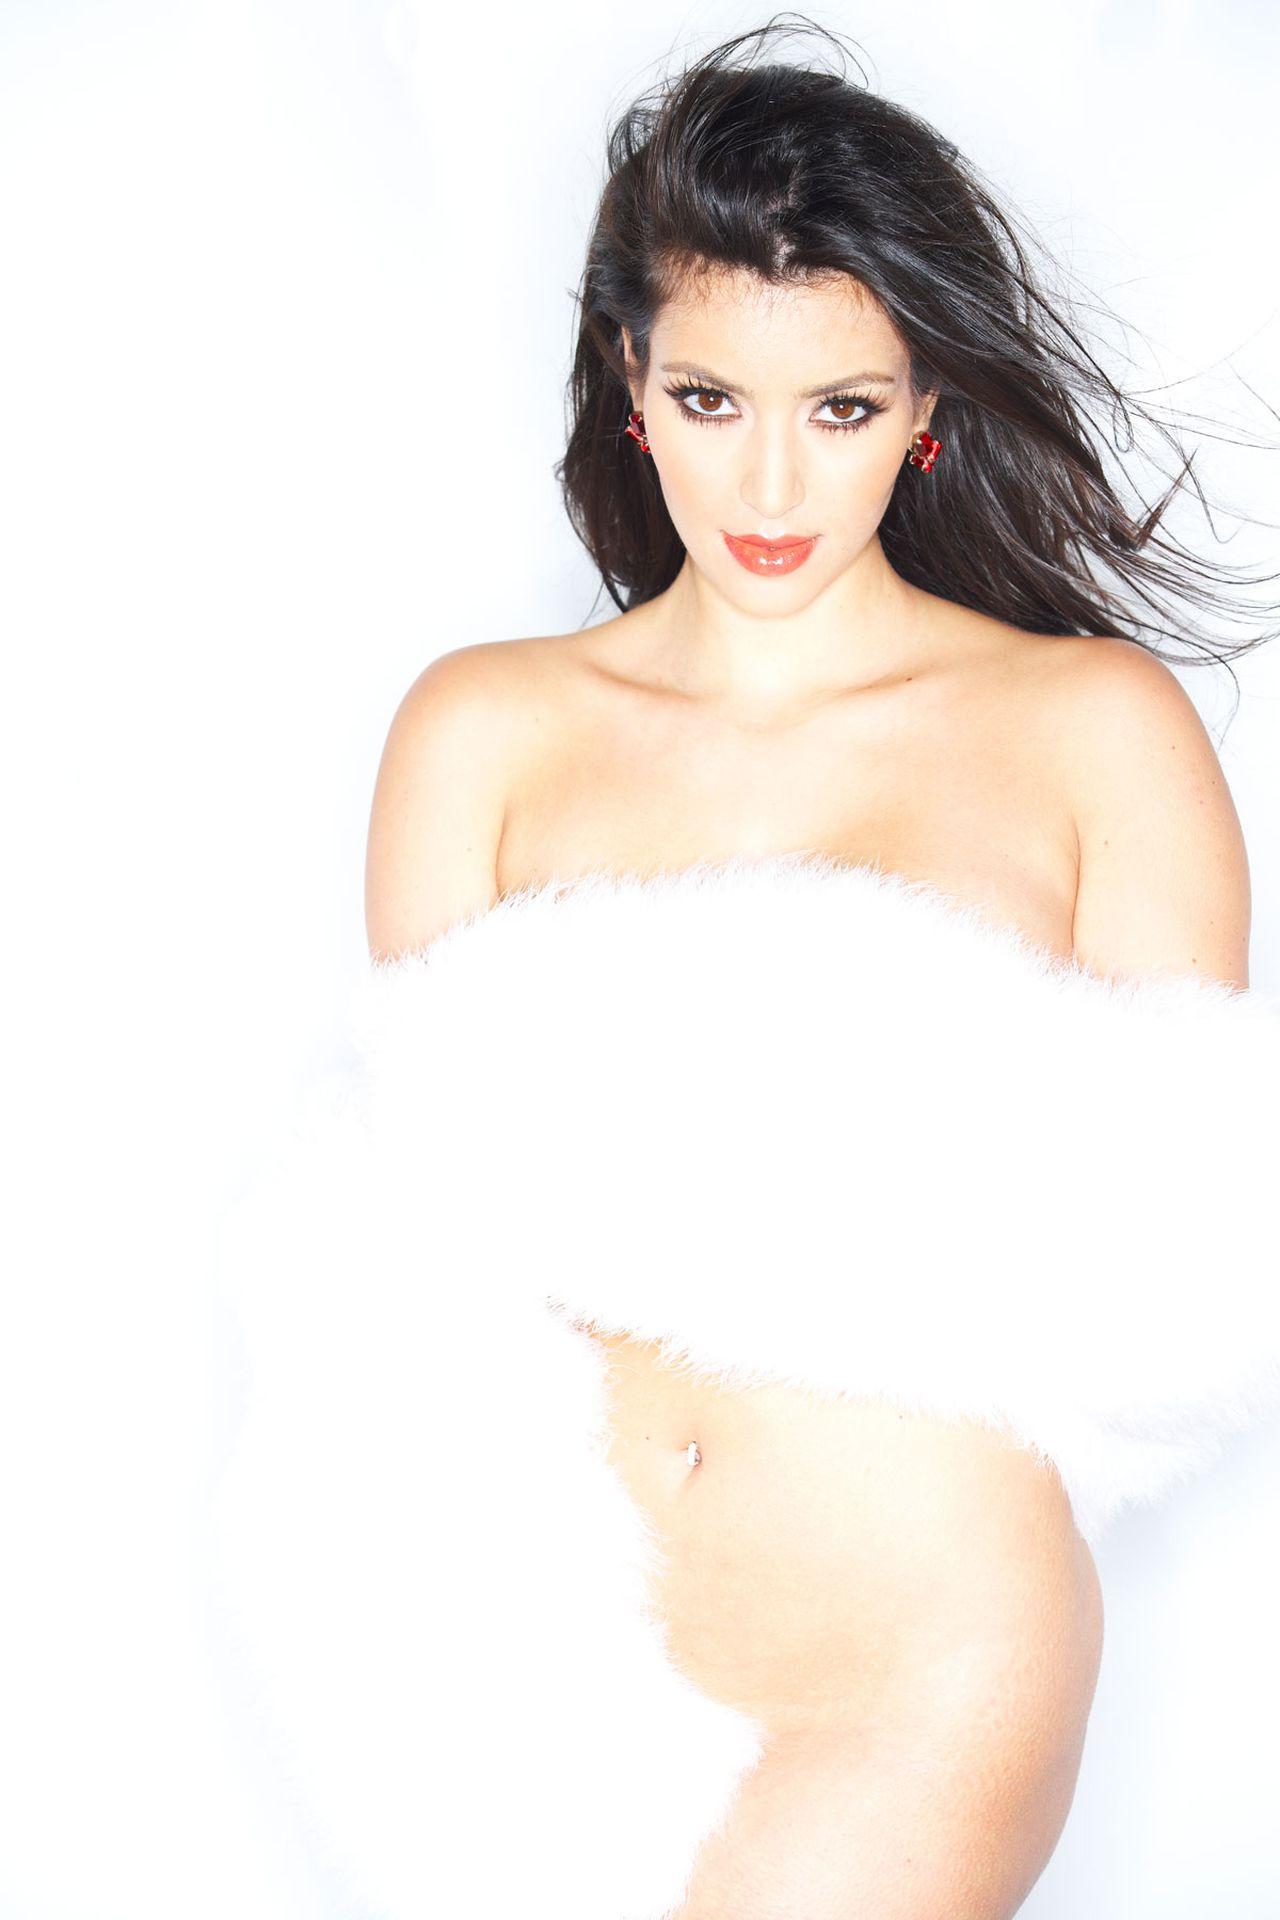 Kim Kardashian nude photos for Playboy The Fappening 2019